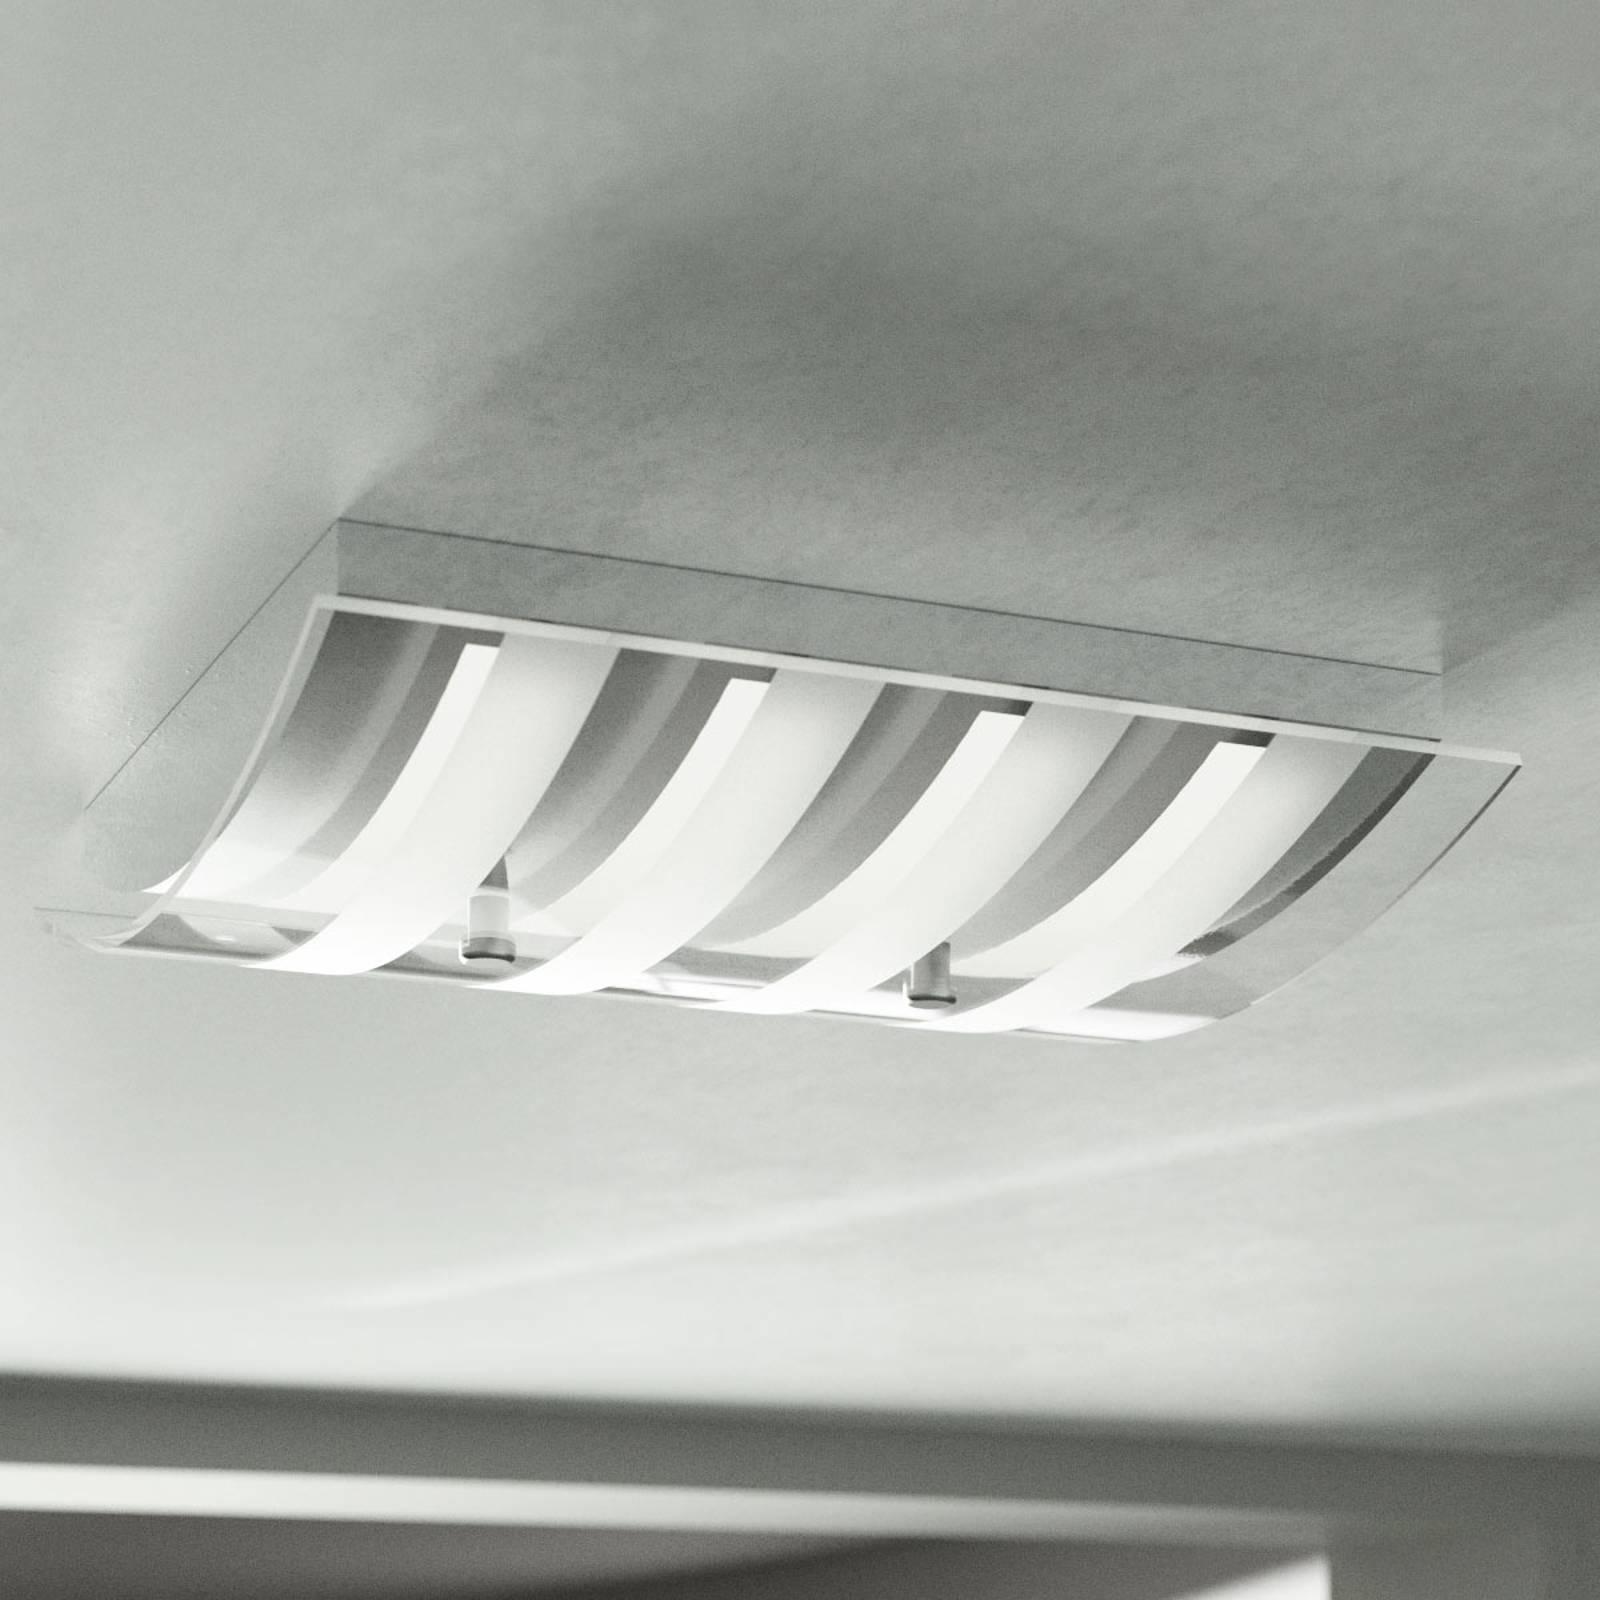 GROSSMANN Vita LED-Deckenleuchte, chrom